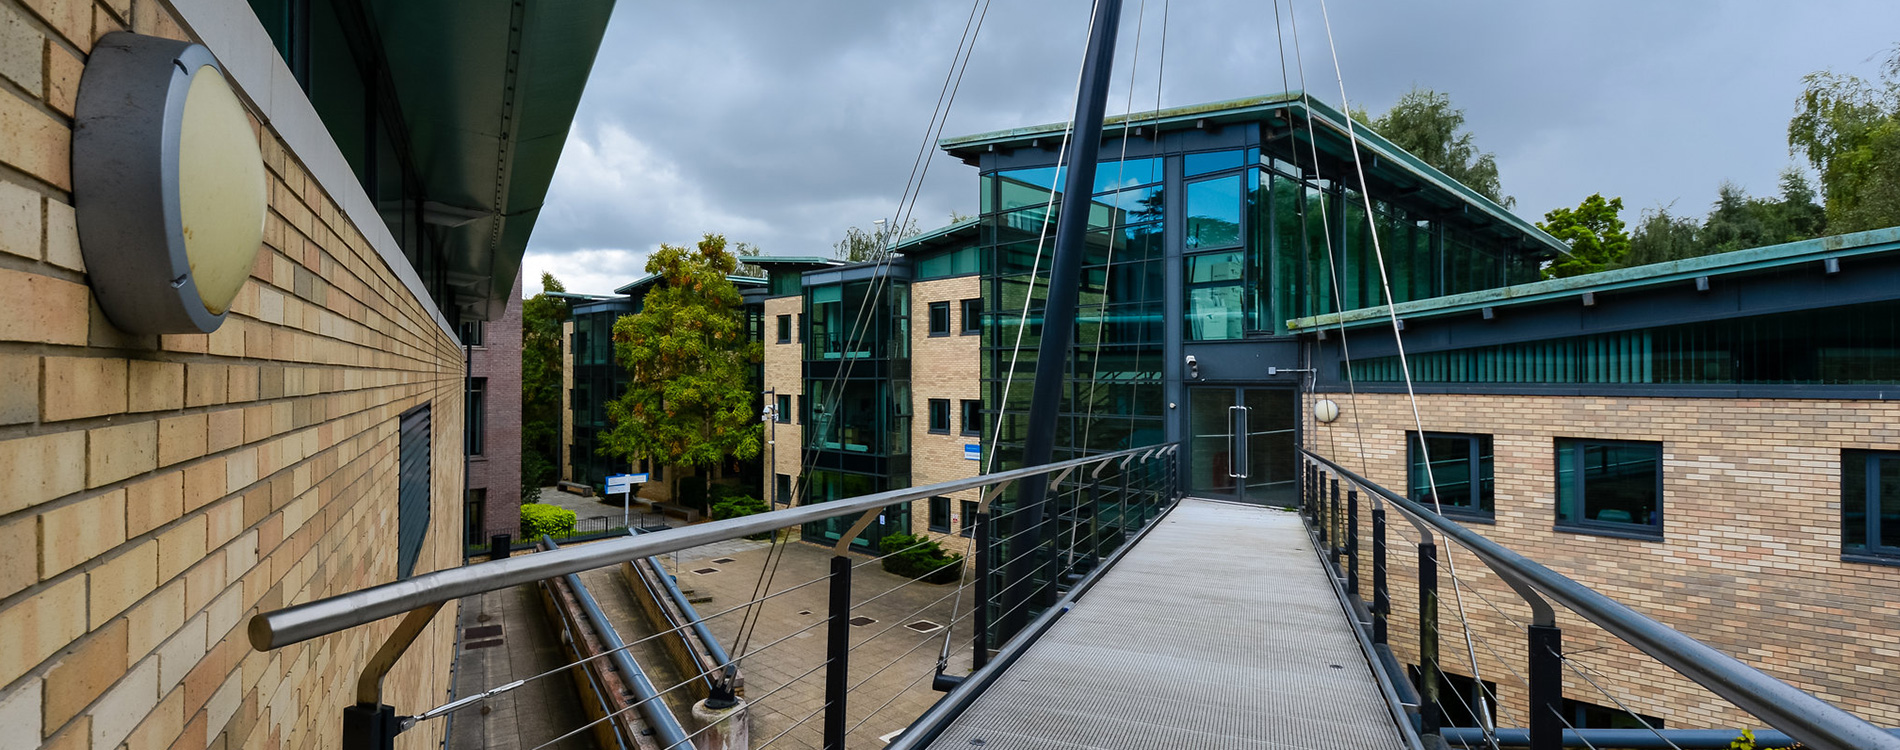 Bridge leading across between two university buildings inside Kingston university